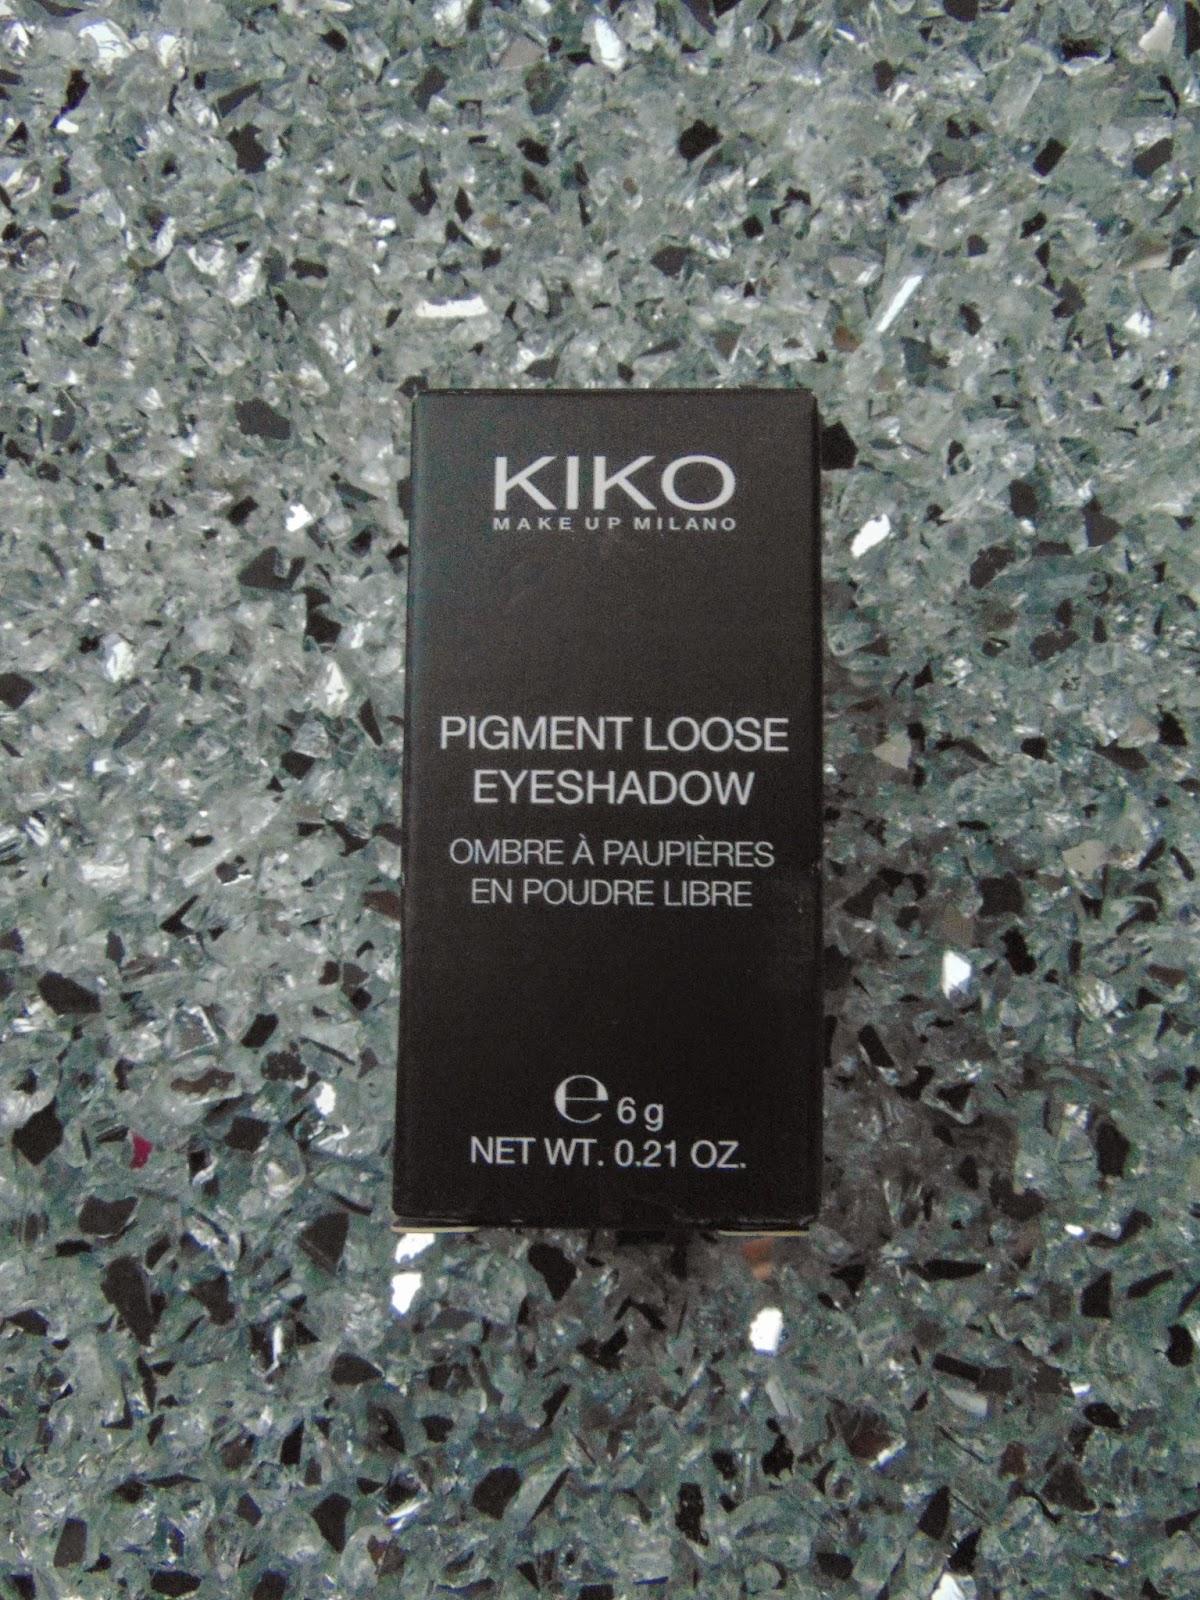 KIKO Pigment Loose Eyeshadow - Nr. 18 - www.annitschkasblog.de